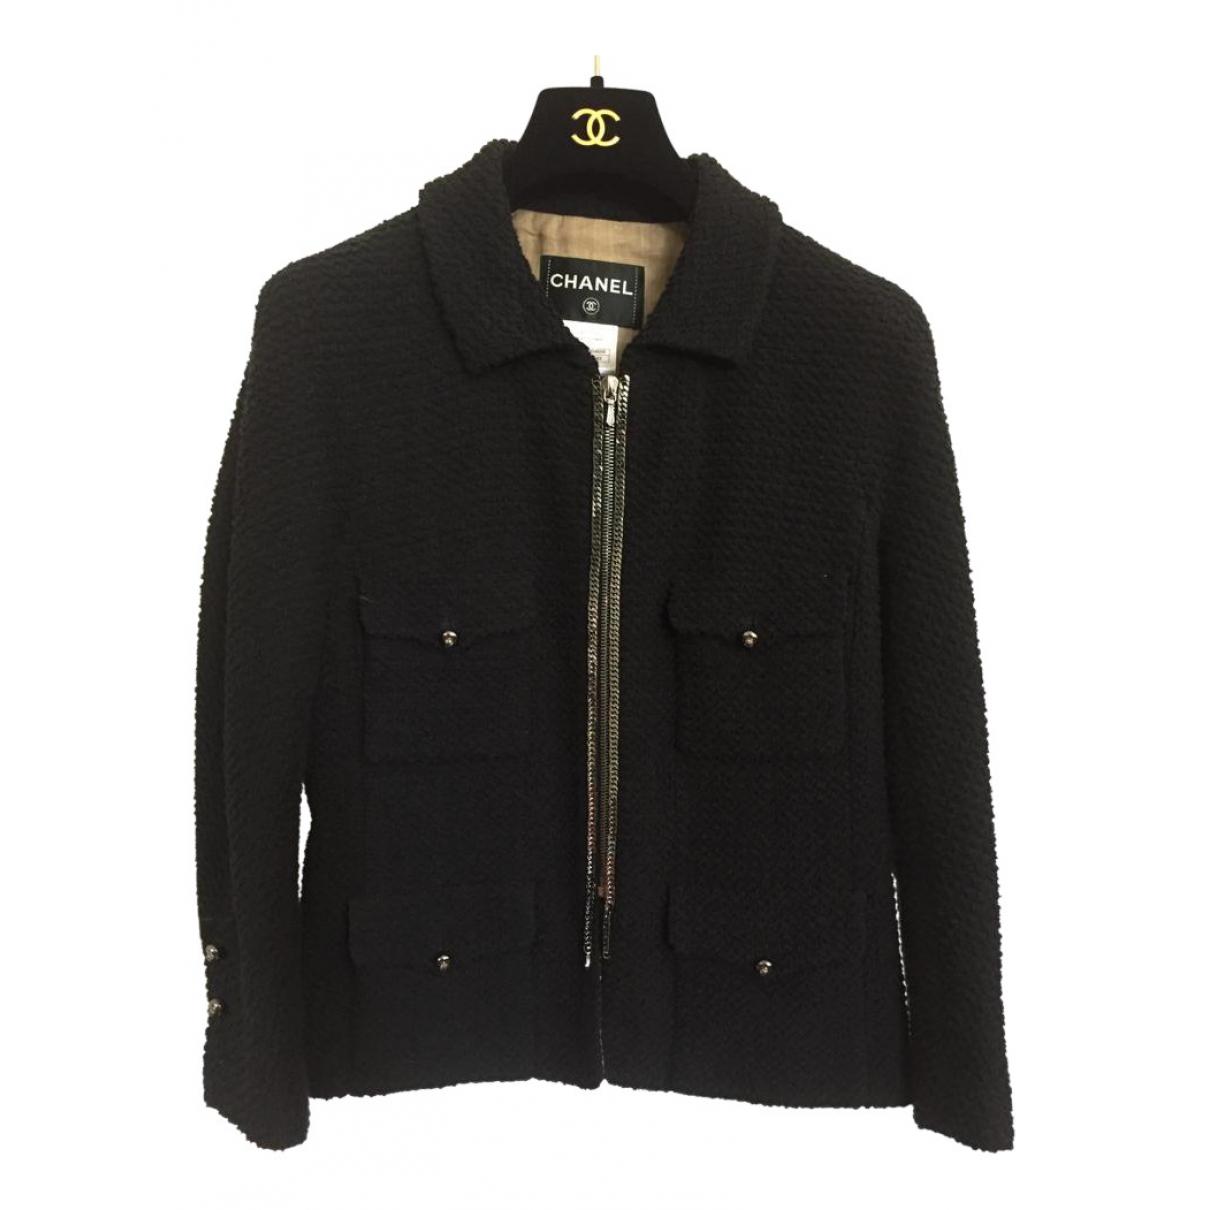 Chanel \N Black Cotton jacket for Women 42 FR